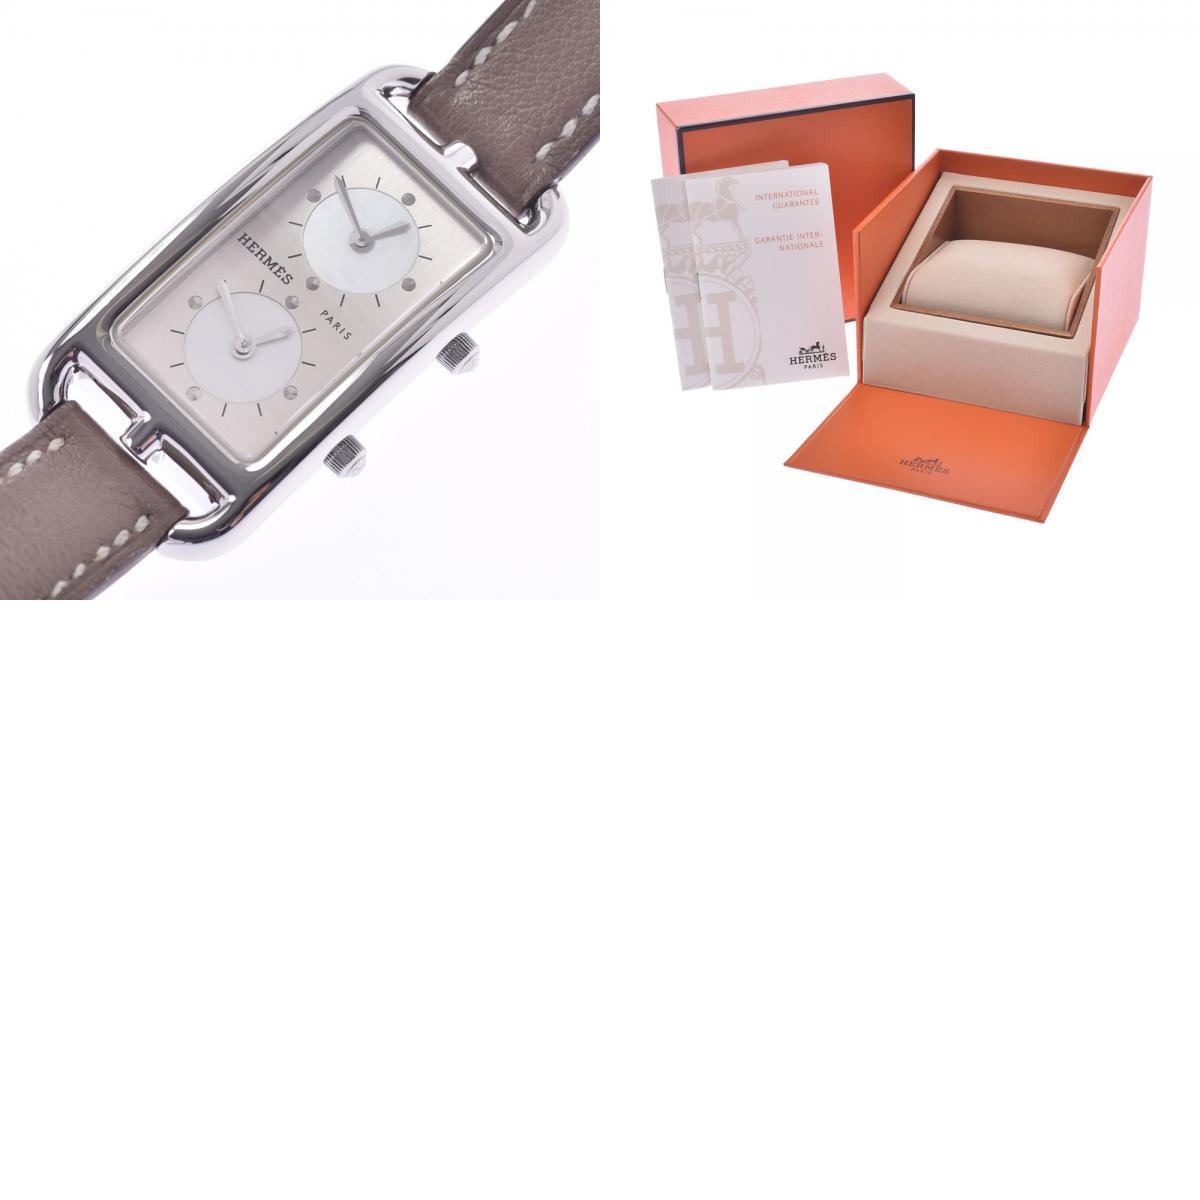 HERMES エルメス ケープコッド ドゥゾーン CC3 210 レディース SS 革 腕時計 クオーツ シルバー文字盤 Aランク銀蔵nOkw08P